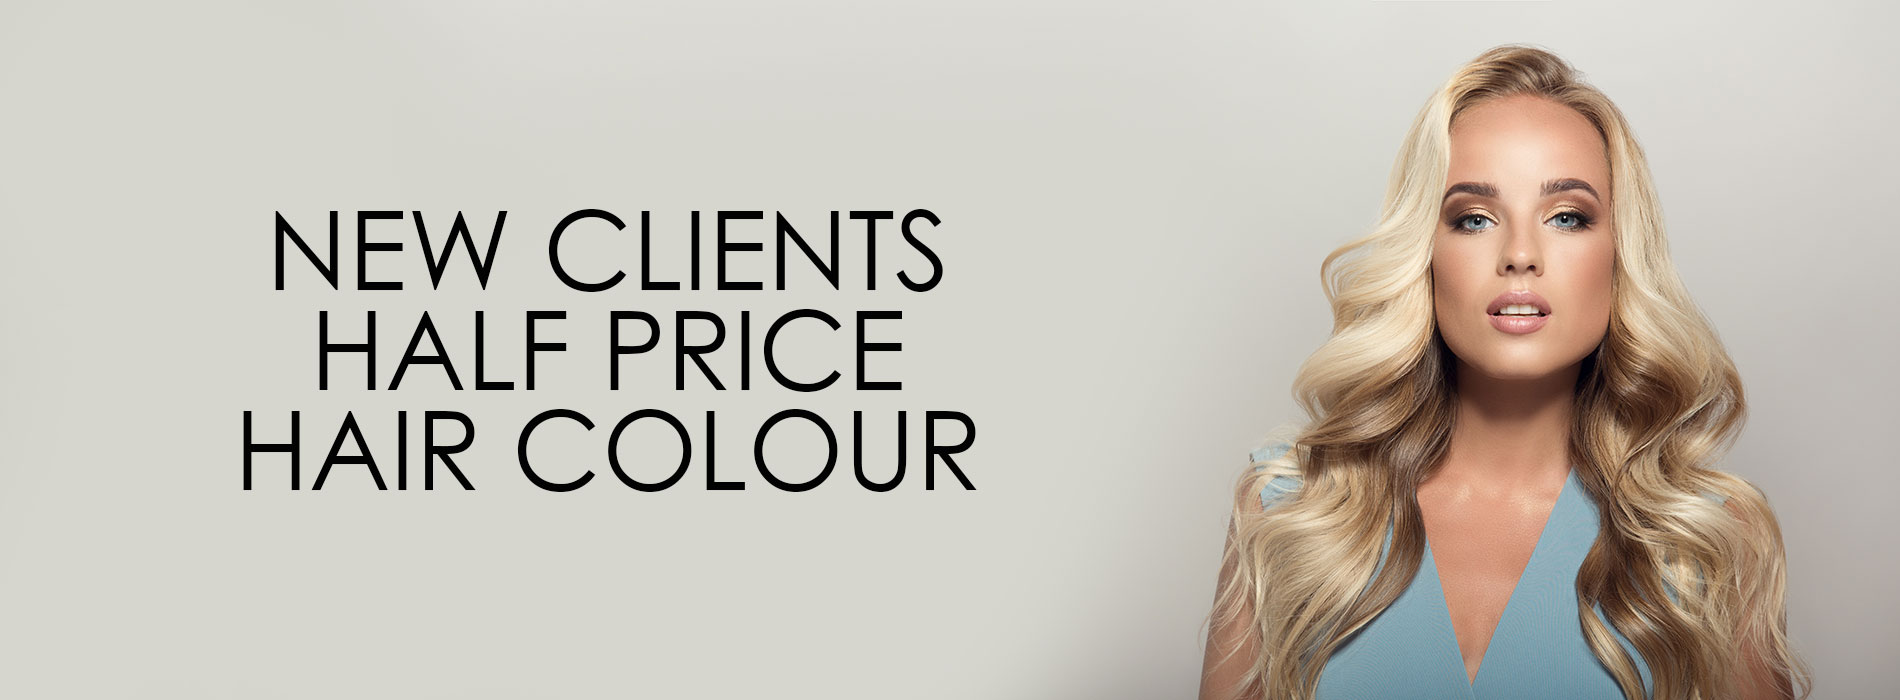 New Clients Half Price Hair Colour Edlesborough Dunstable Hairdressers